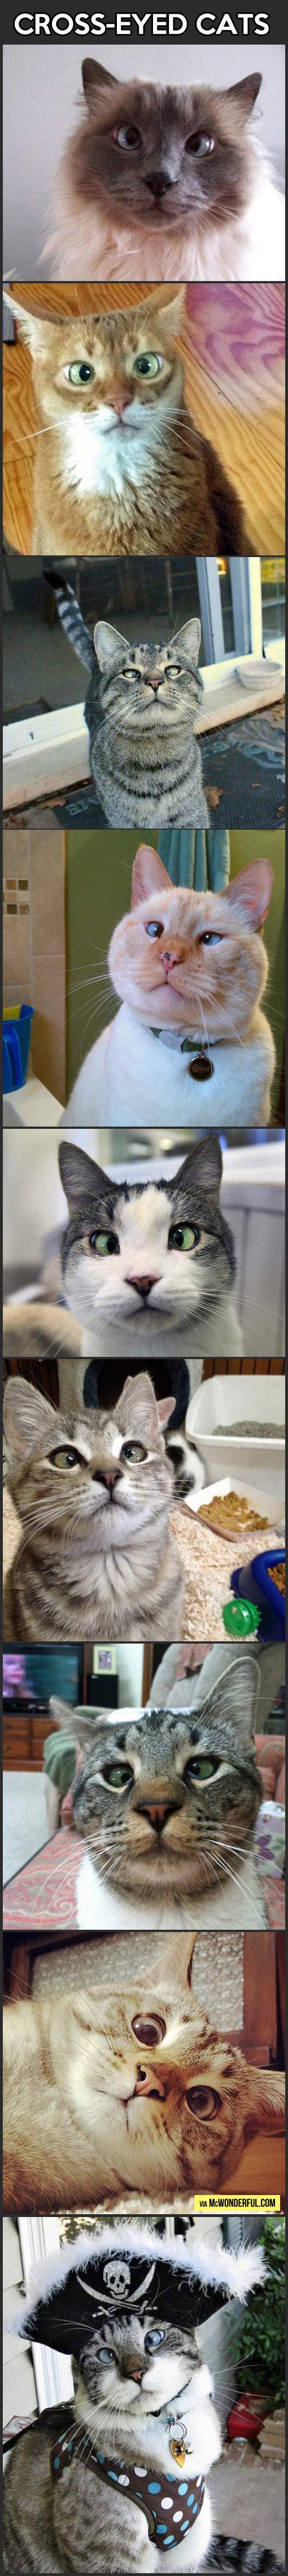 funny-derpy-cats-cross-eyes